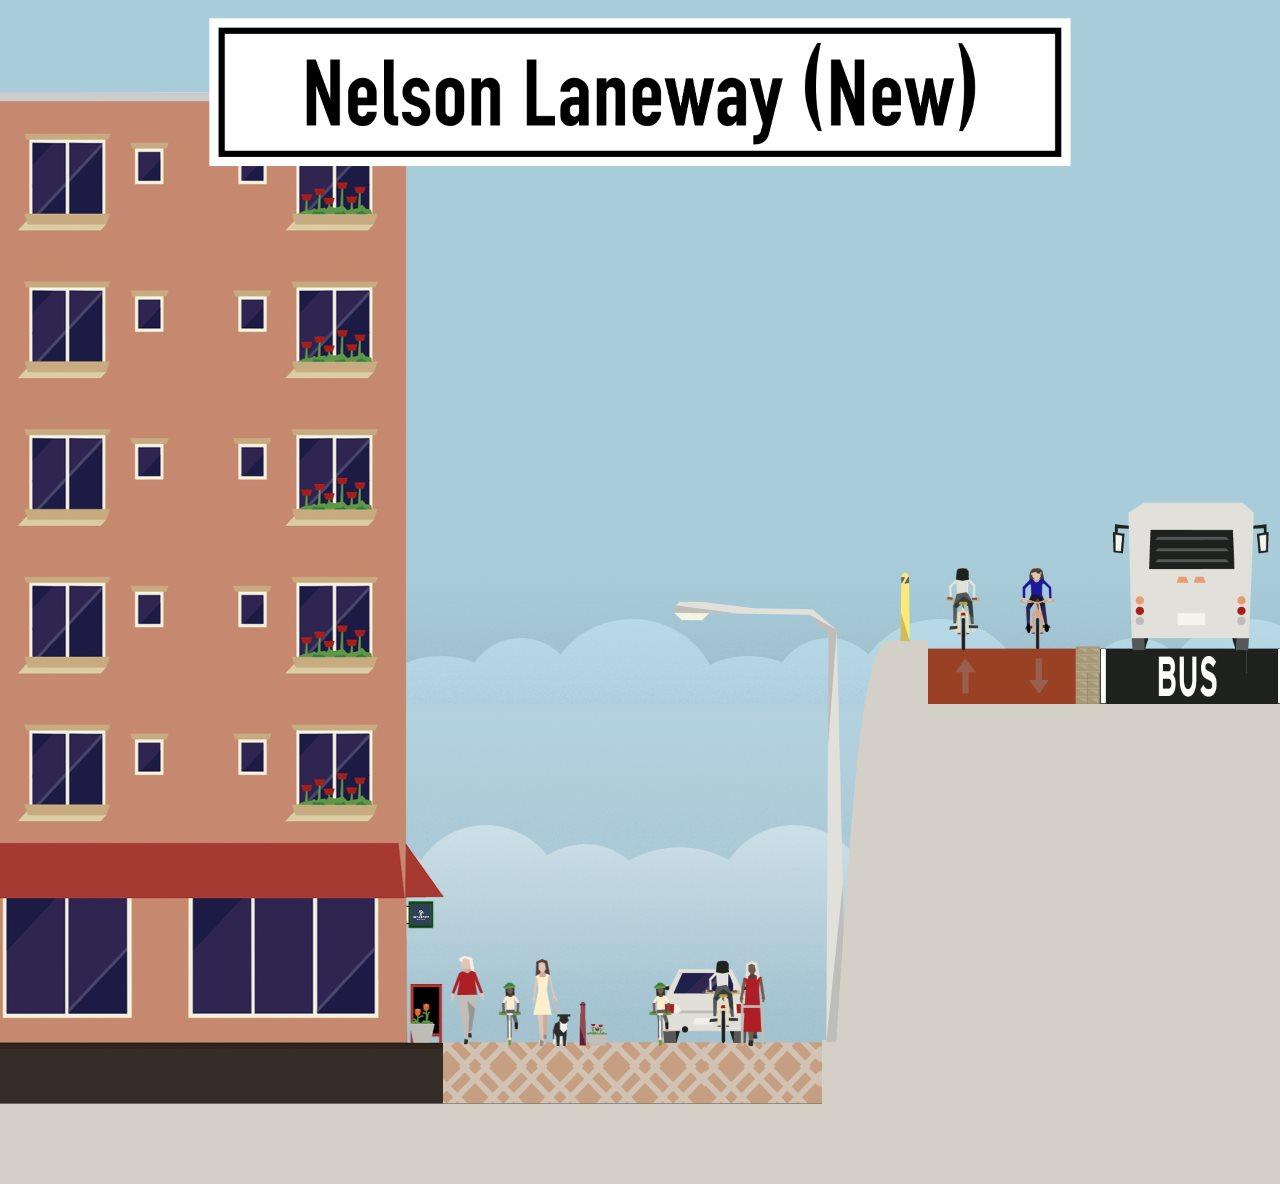 nelson-laneway-new.jpg